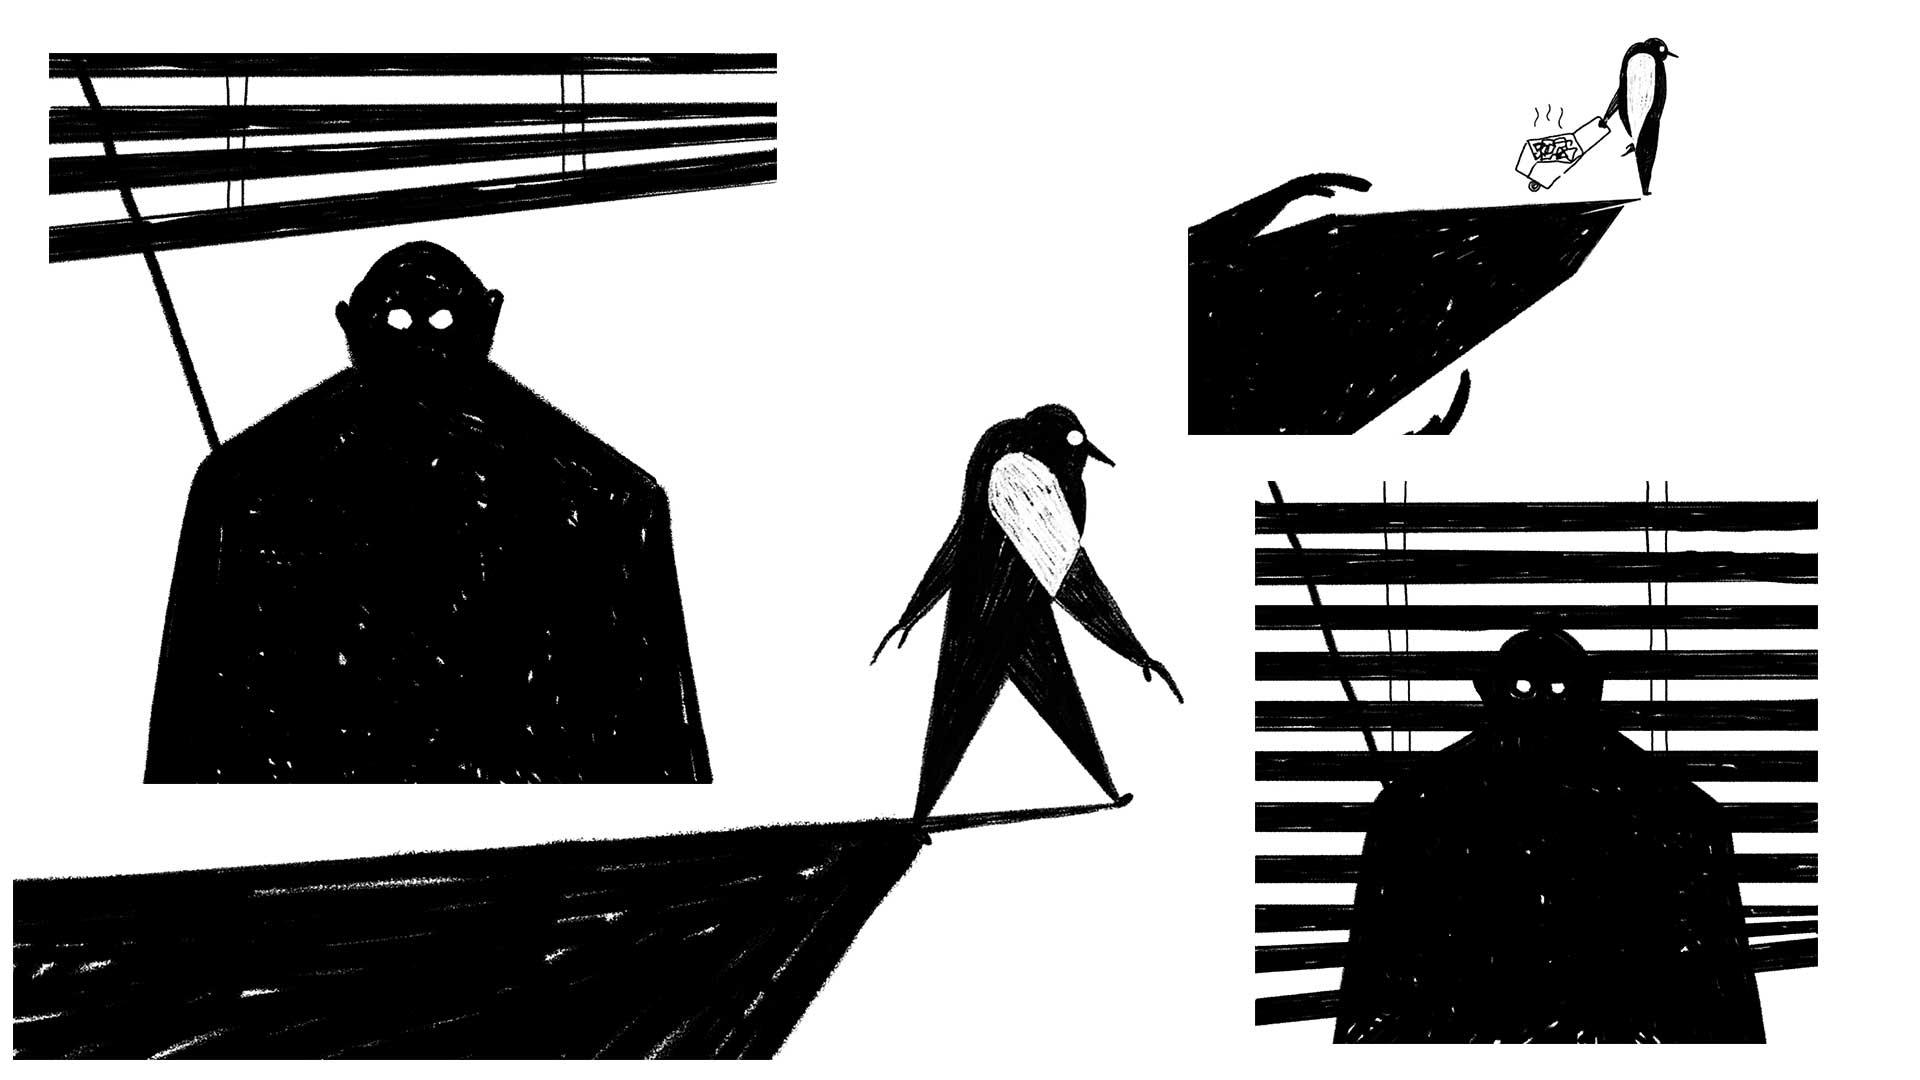 Story board of swamp man walking town